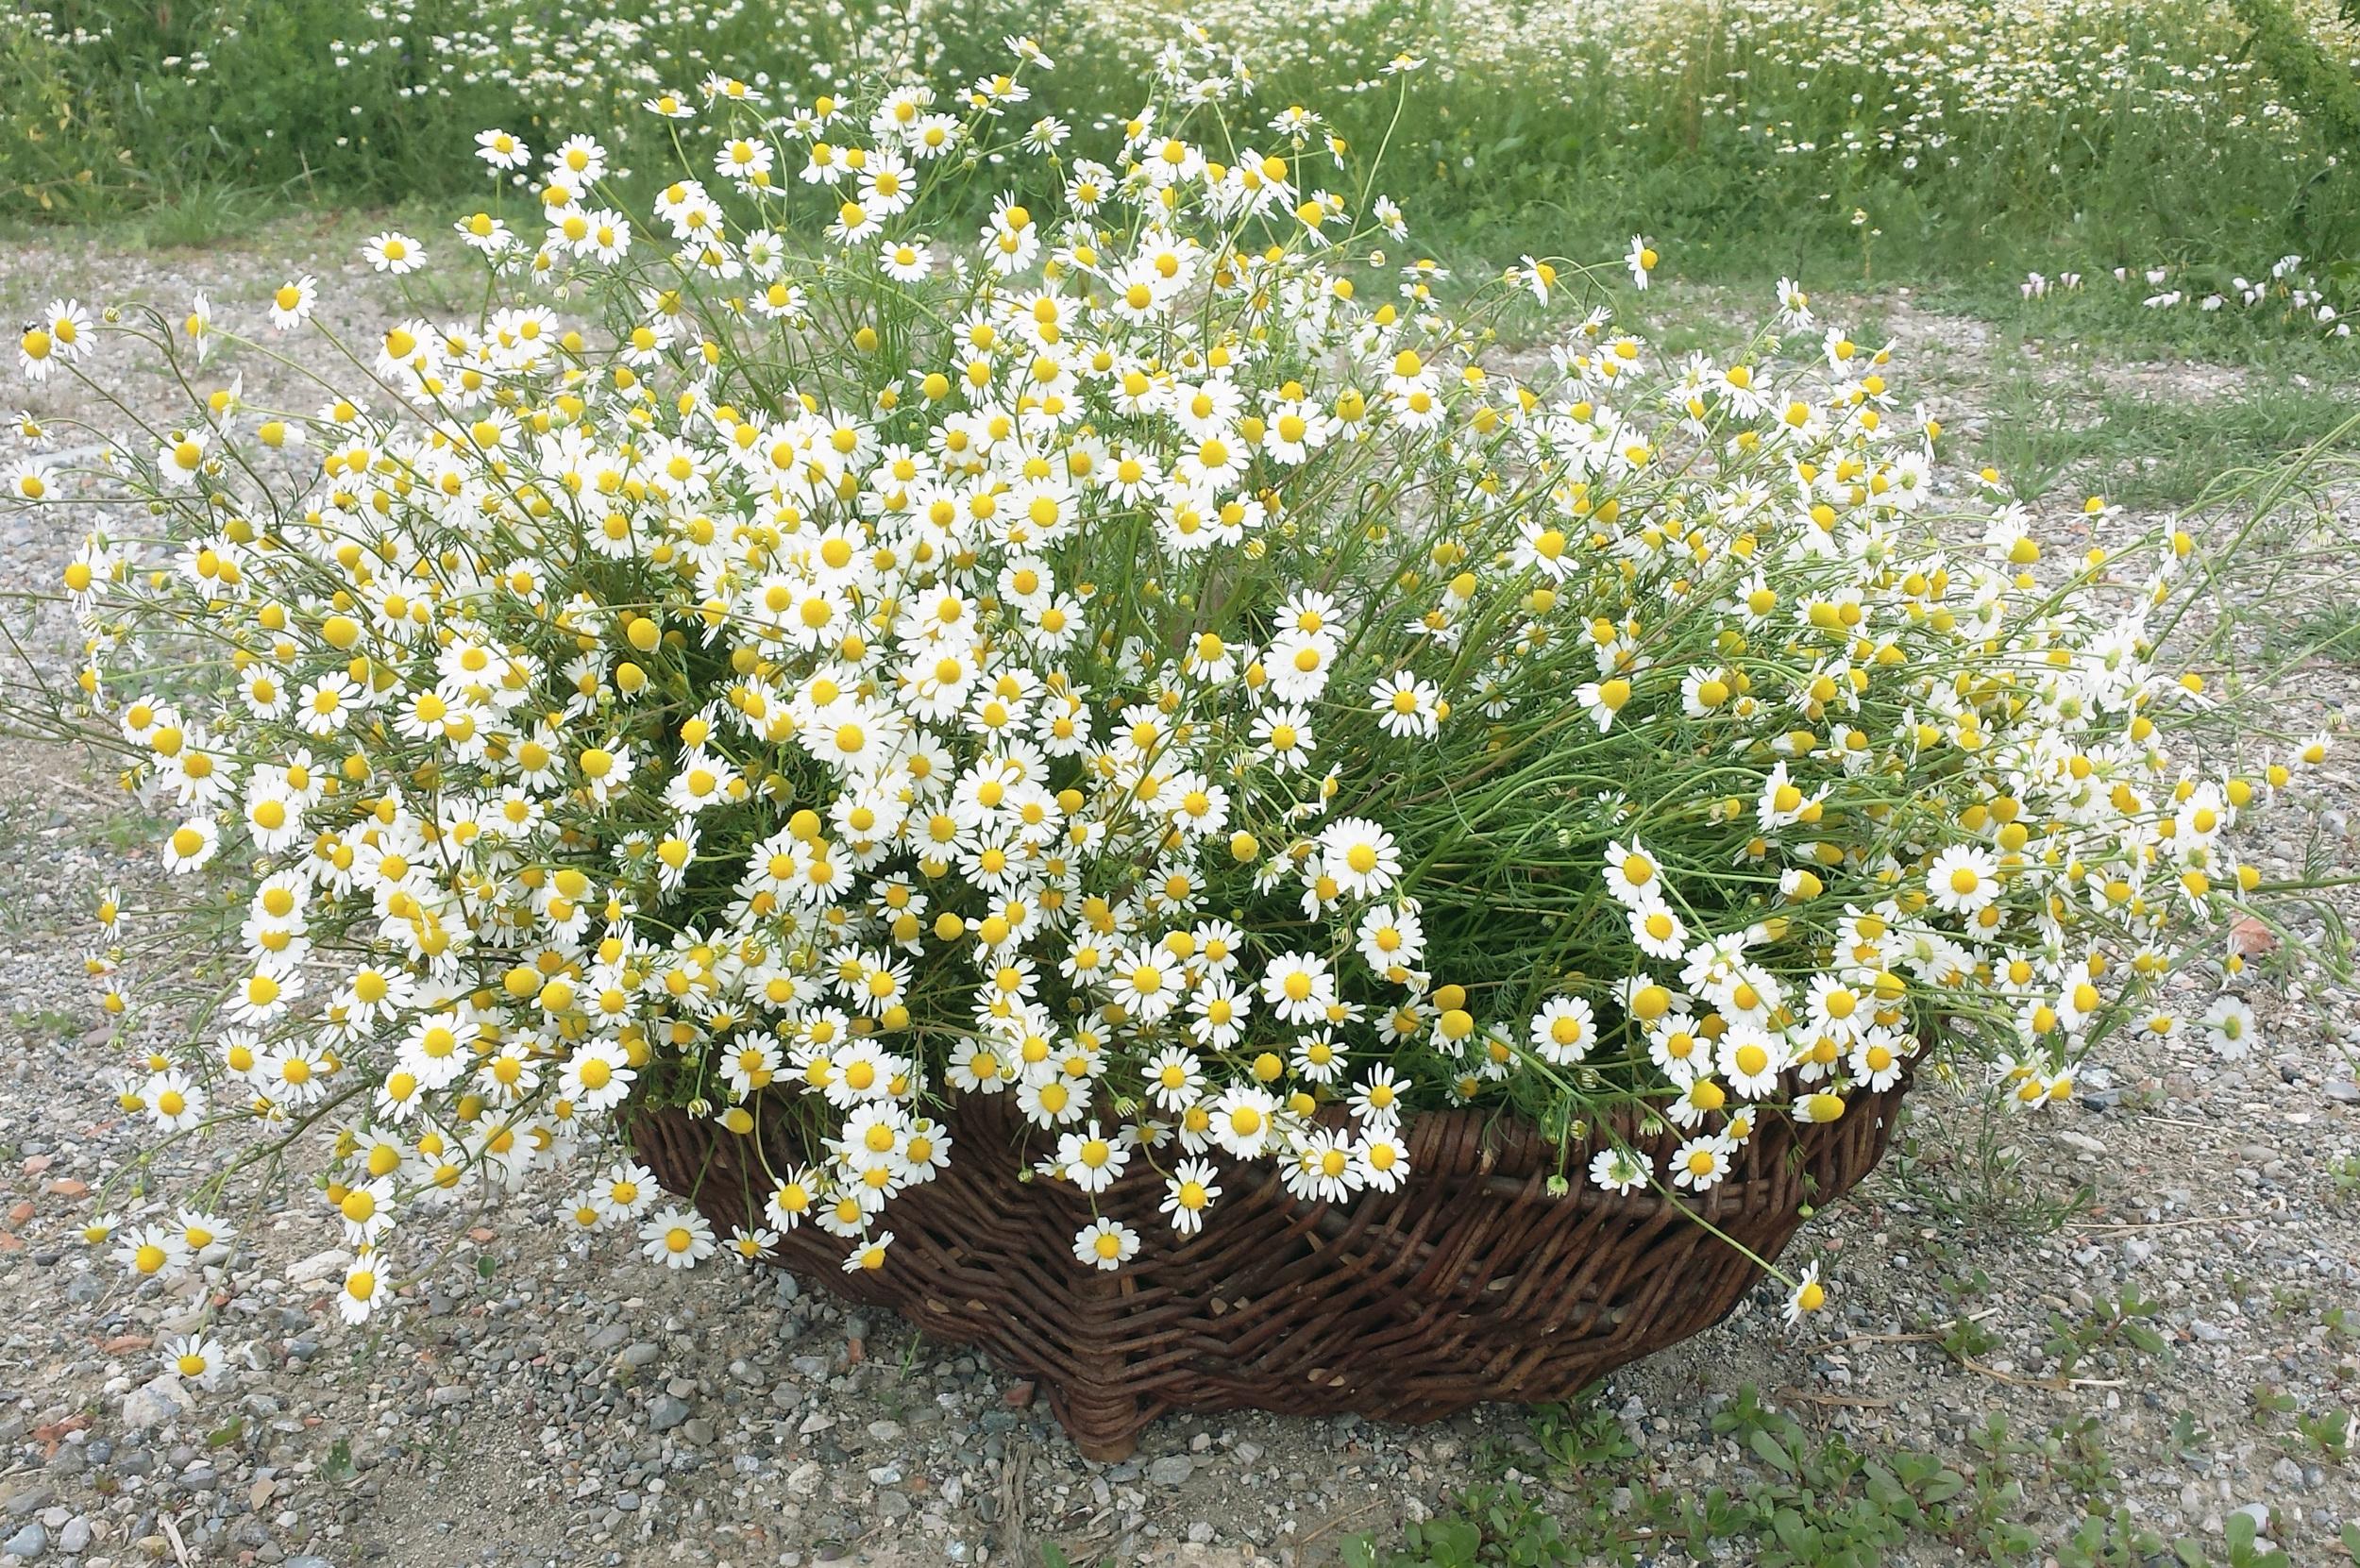 Basket of organic chamomile flowers